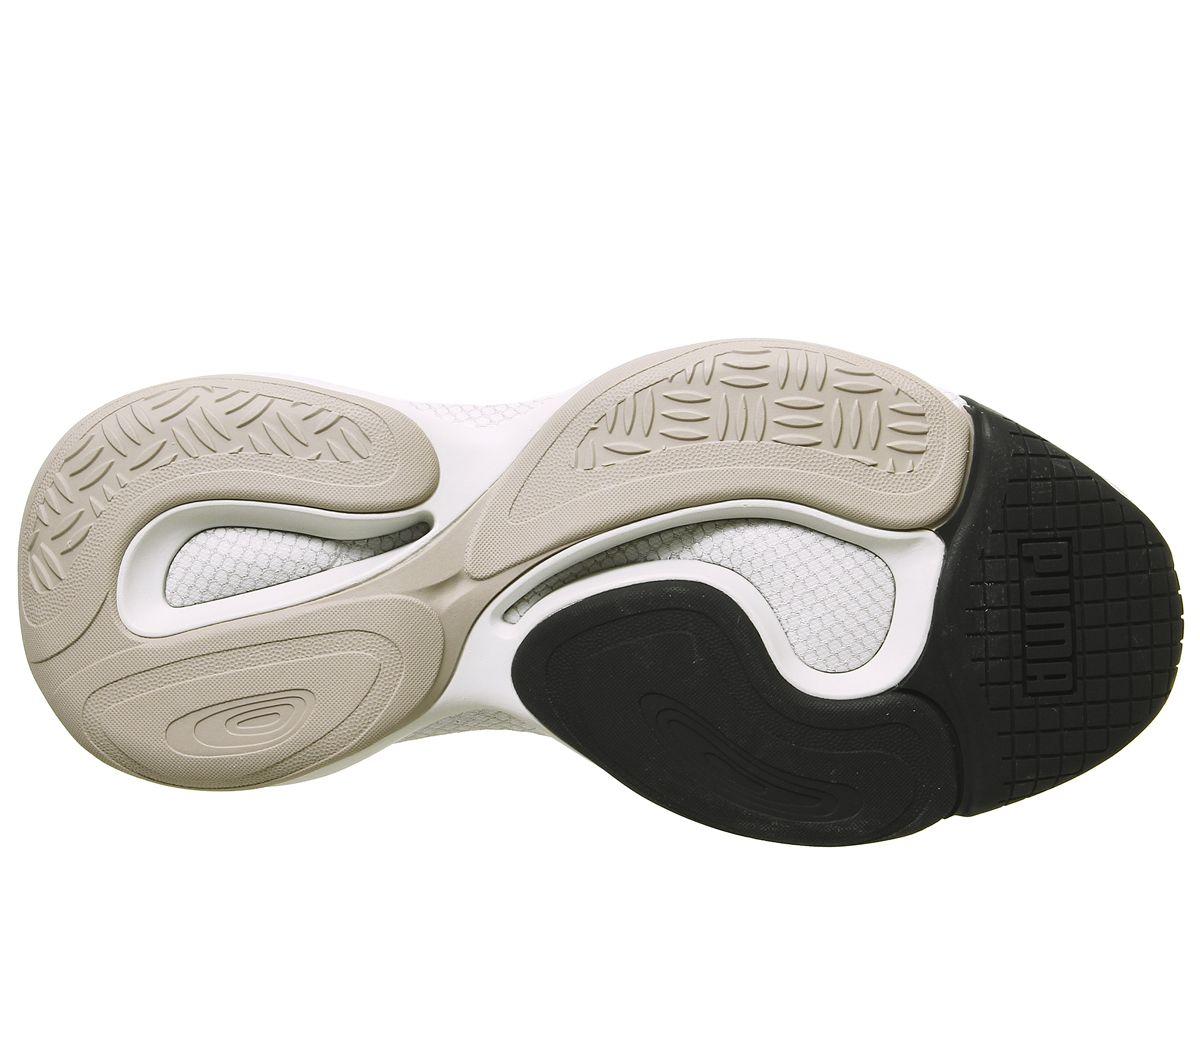 Puma-Alteration-Baskets-Puma-Silver-calcaire-Baskets-Chaussures miniature 4